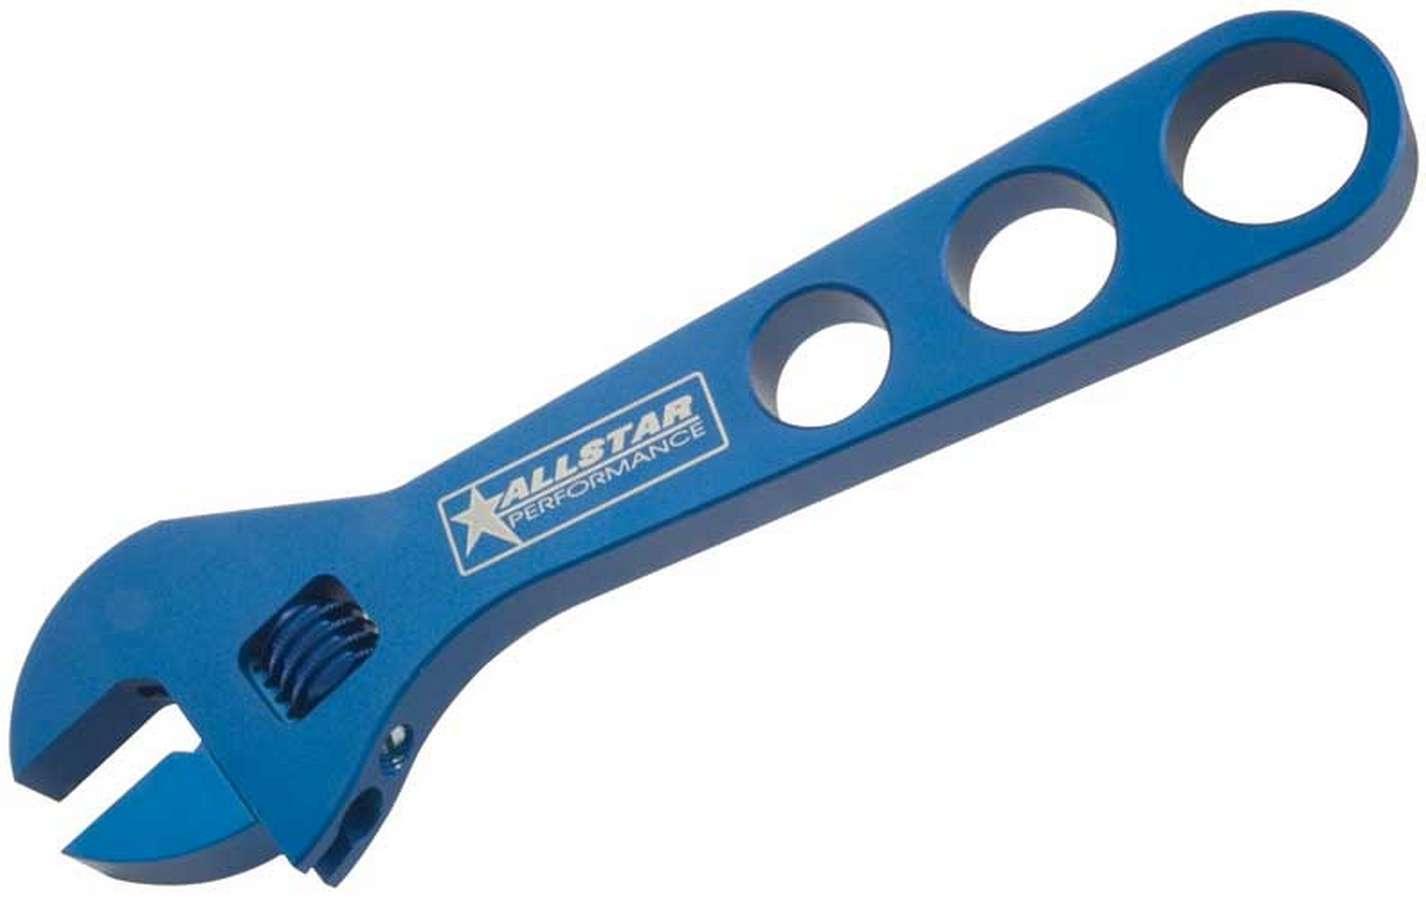 Allstar Performance Alum Adj Wrench 0-10AN